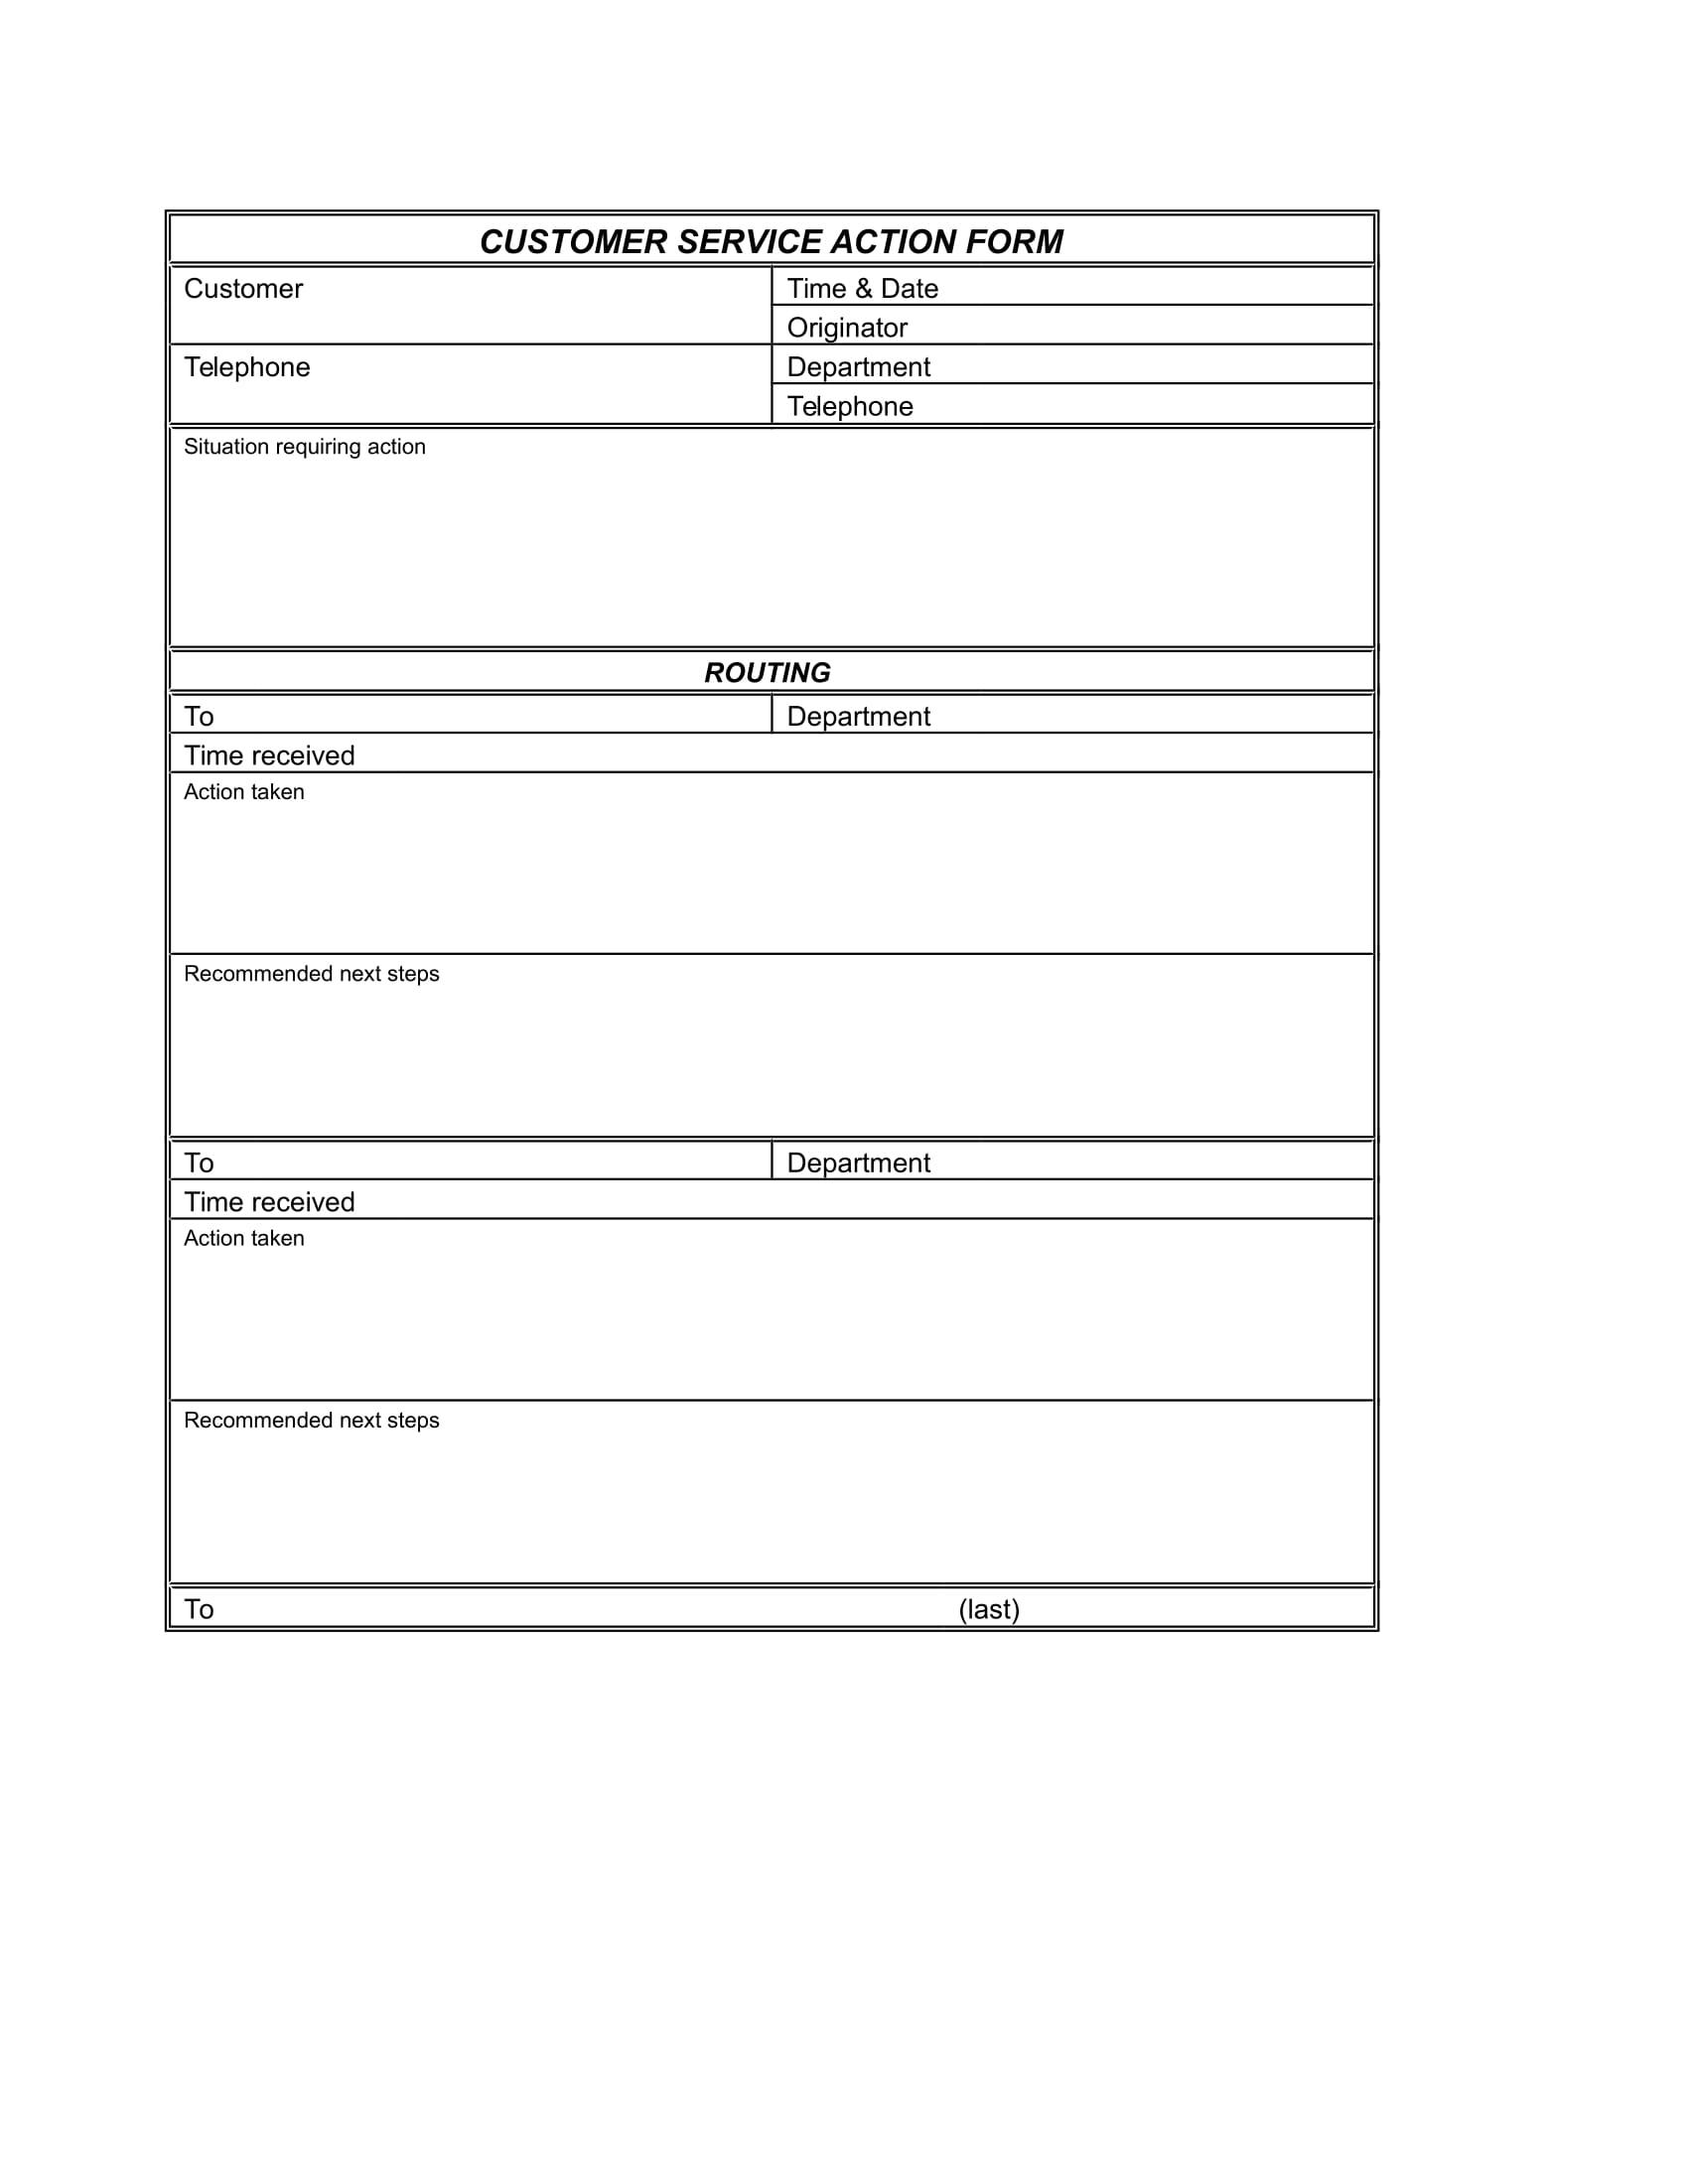 basic customer service action form 2